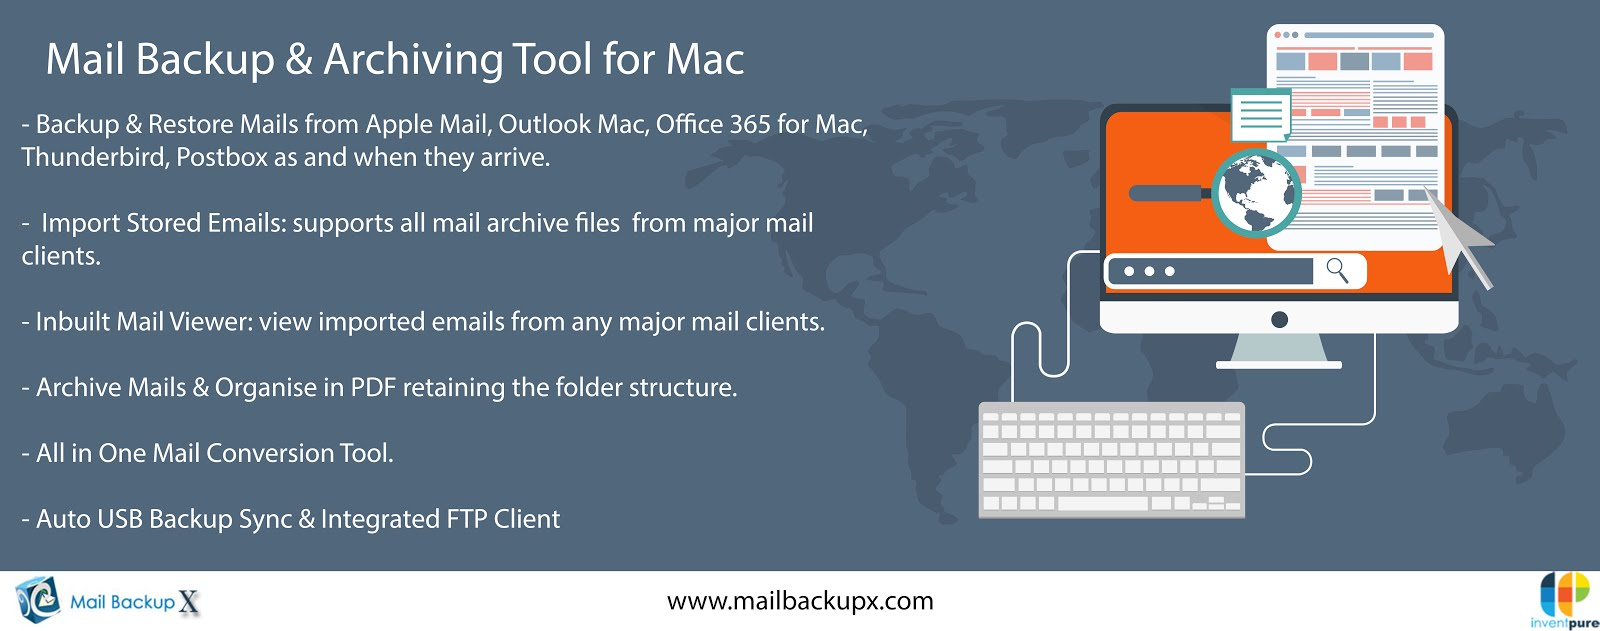 Mac Mail Backup Application